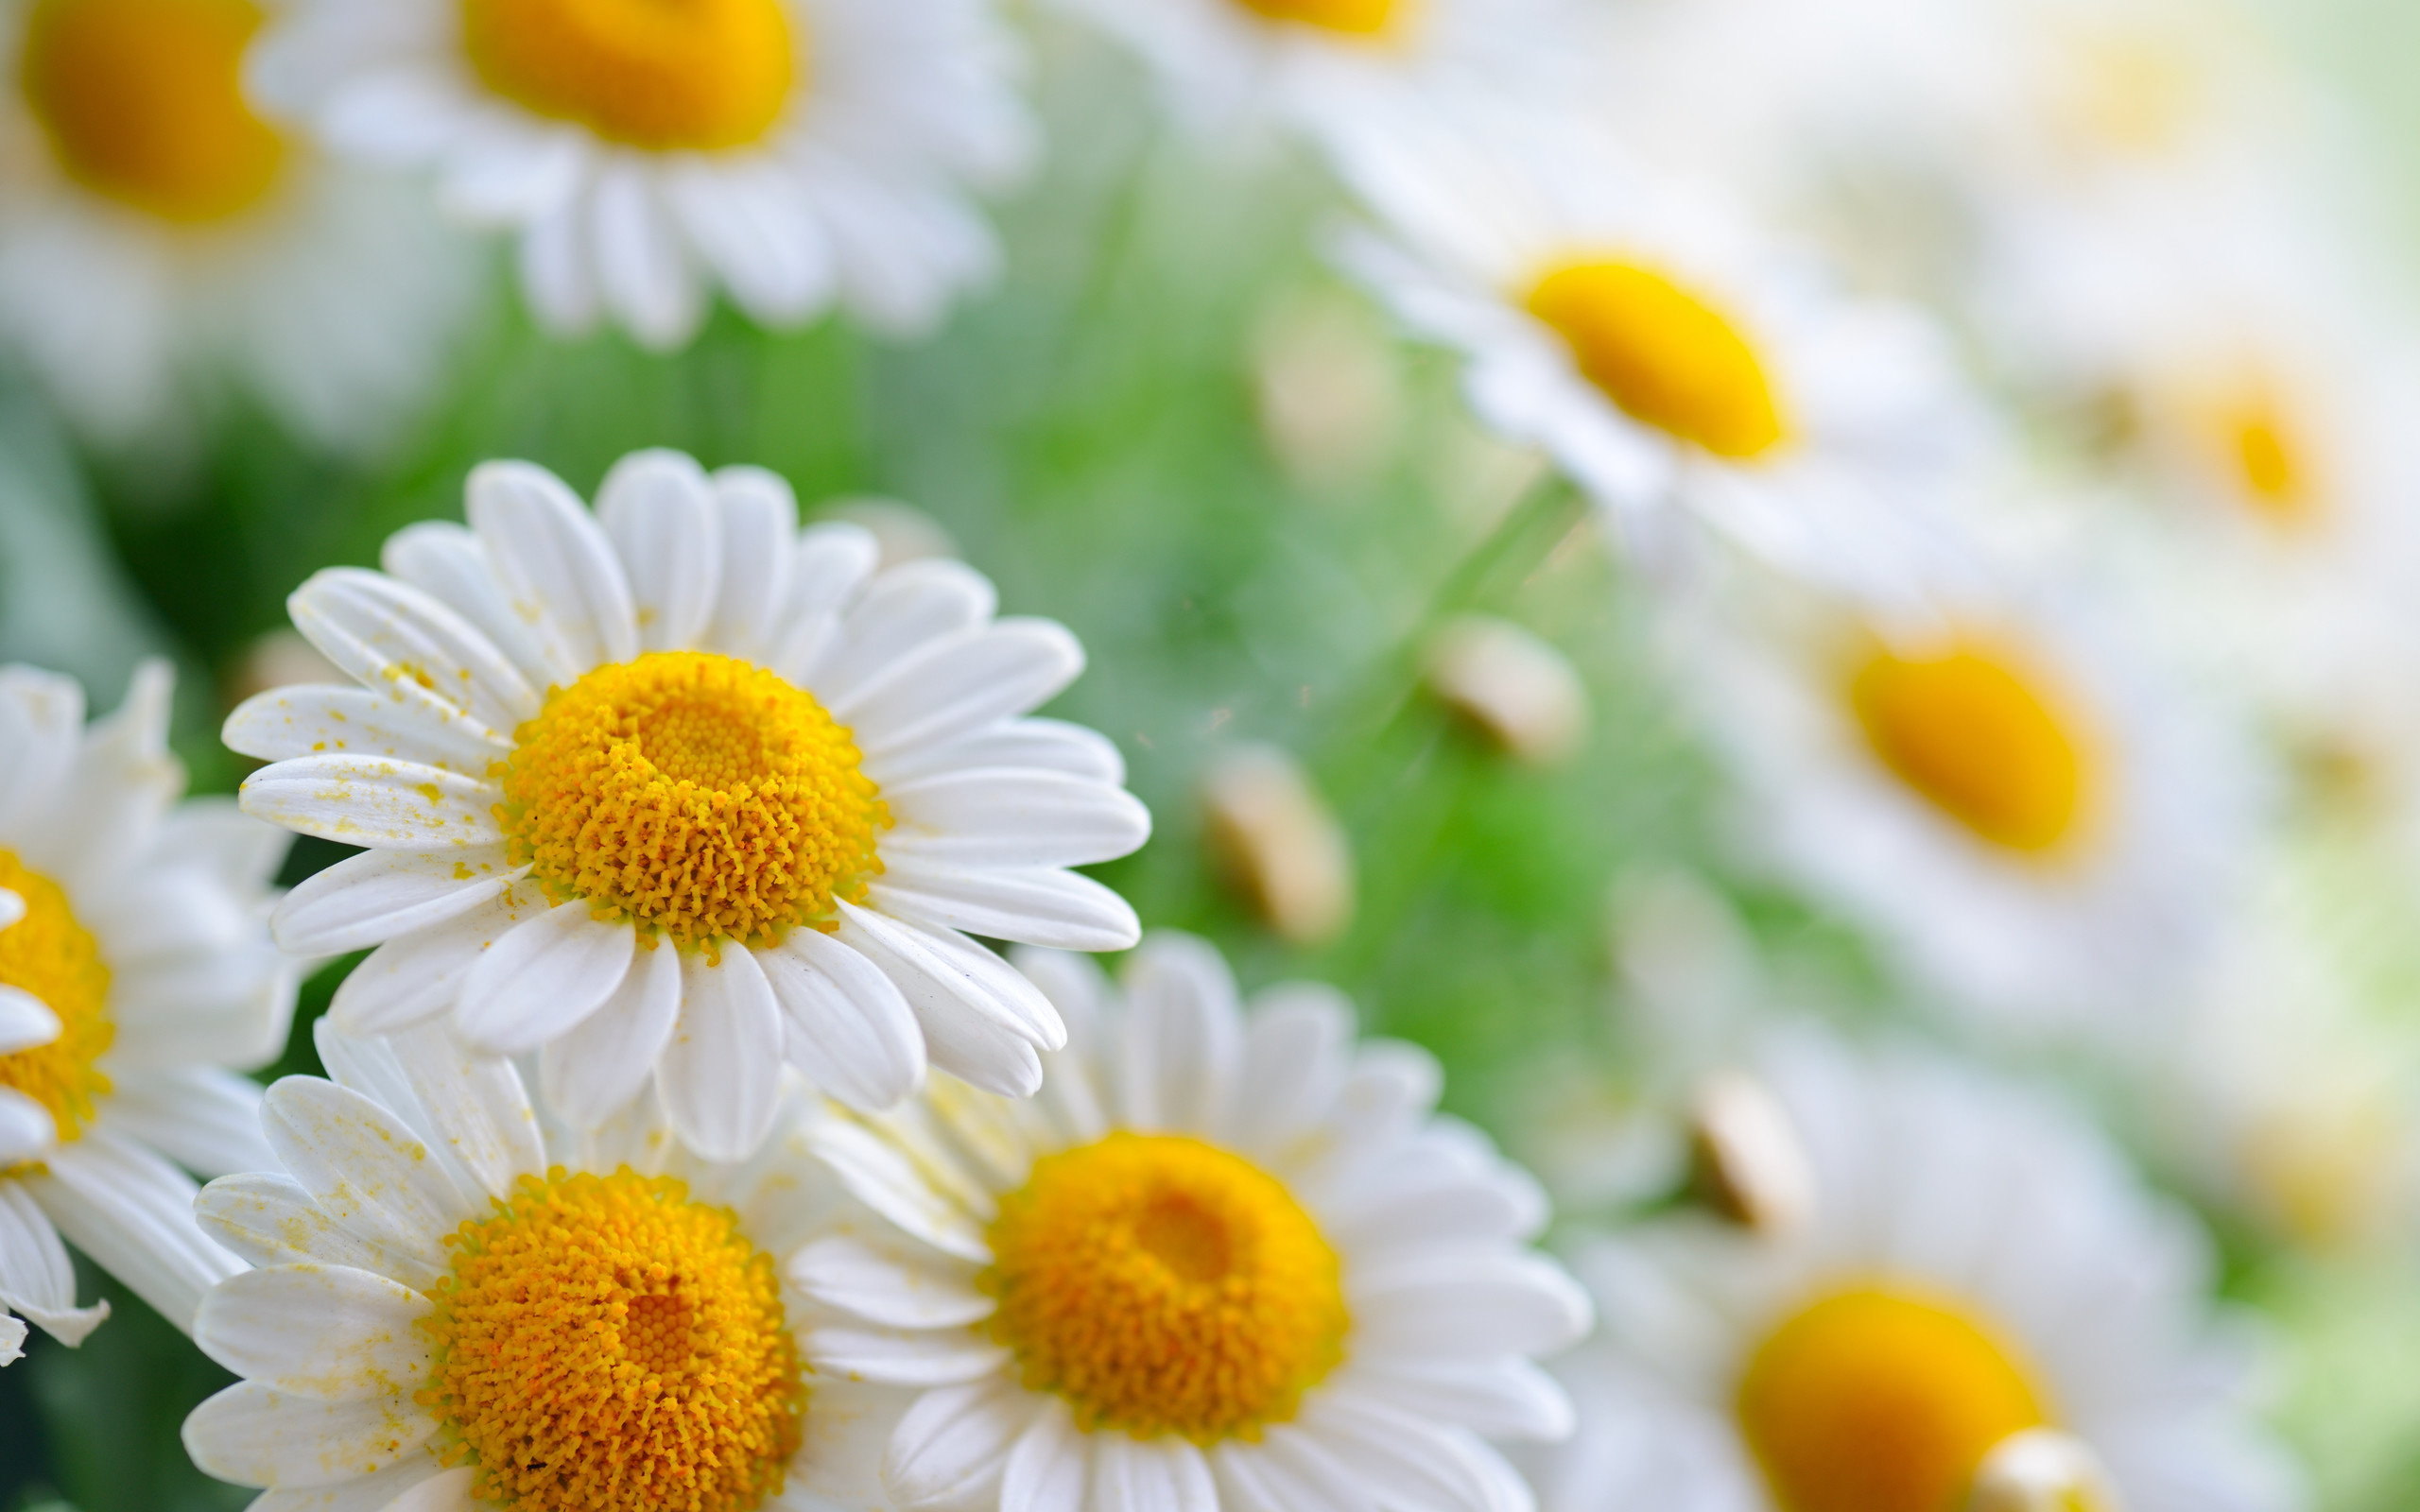 Beauriful Daisy Flower Wallpapers HD